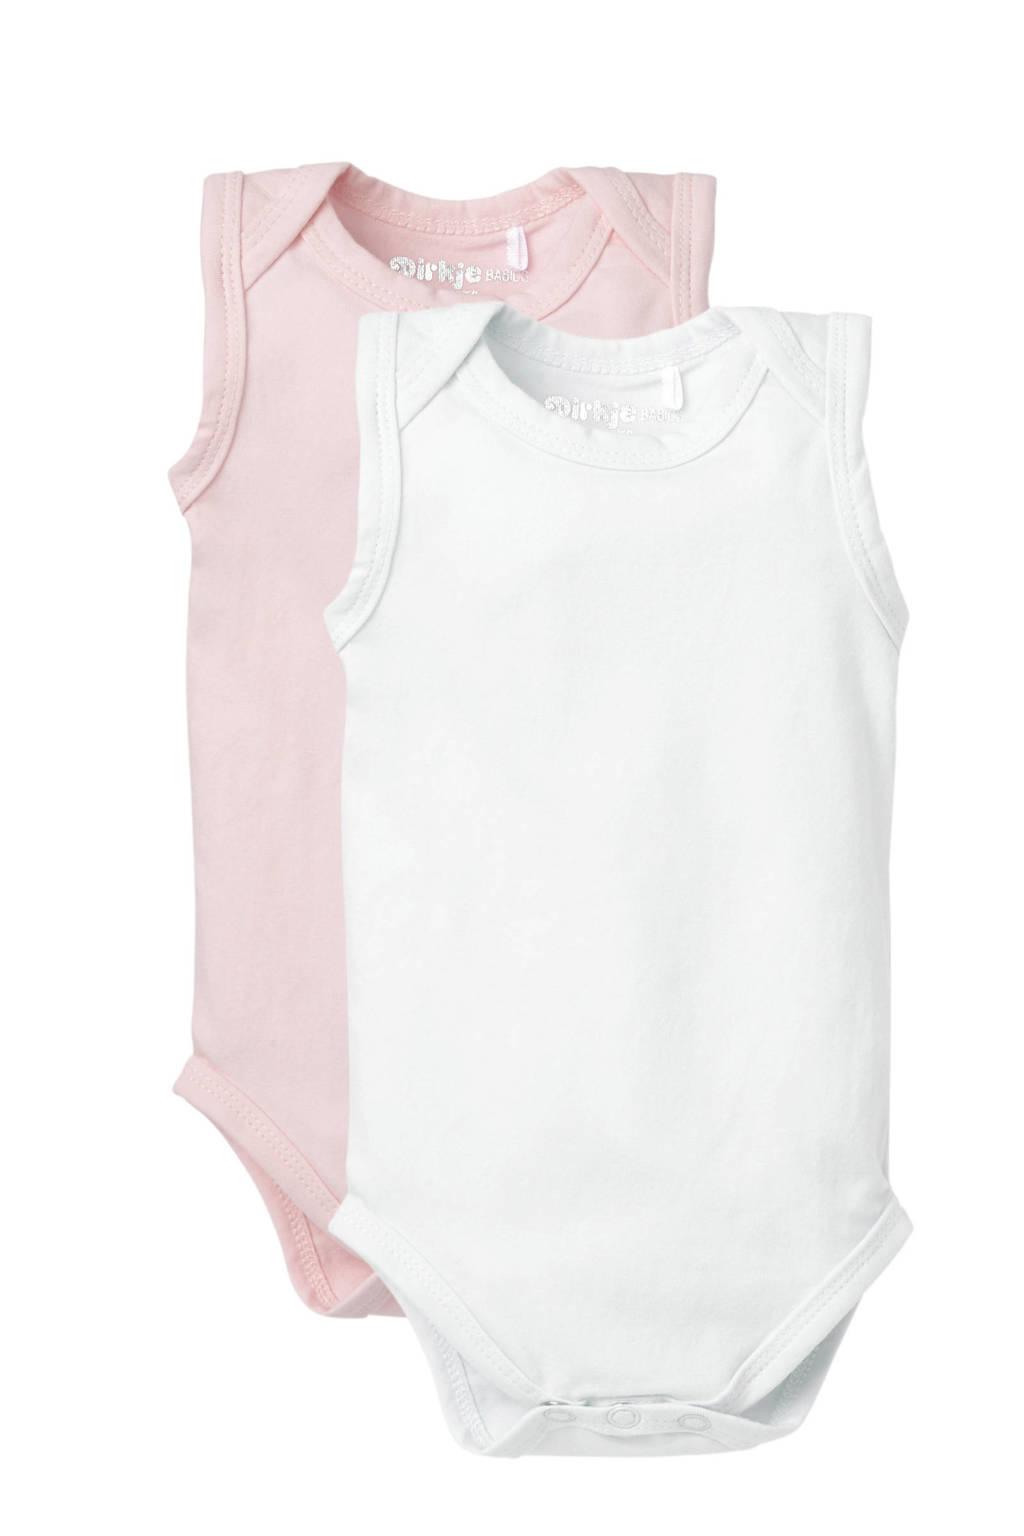 Dirkje newborn baby romper - set van 2 lichtroze/wit, Lichtroze/wit, Mouwloos